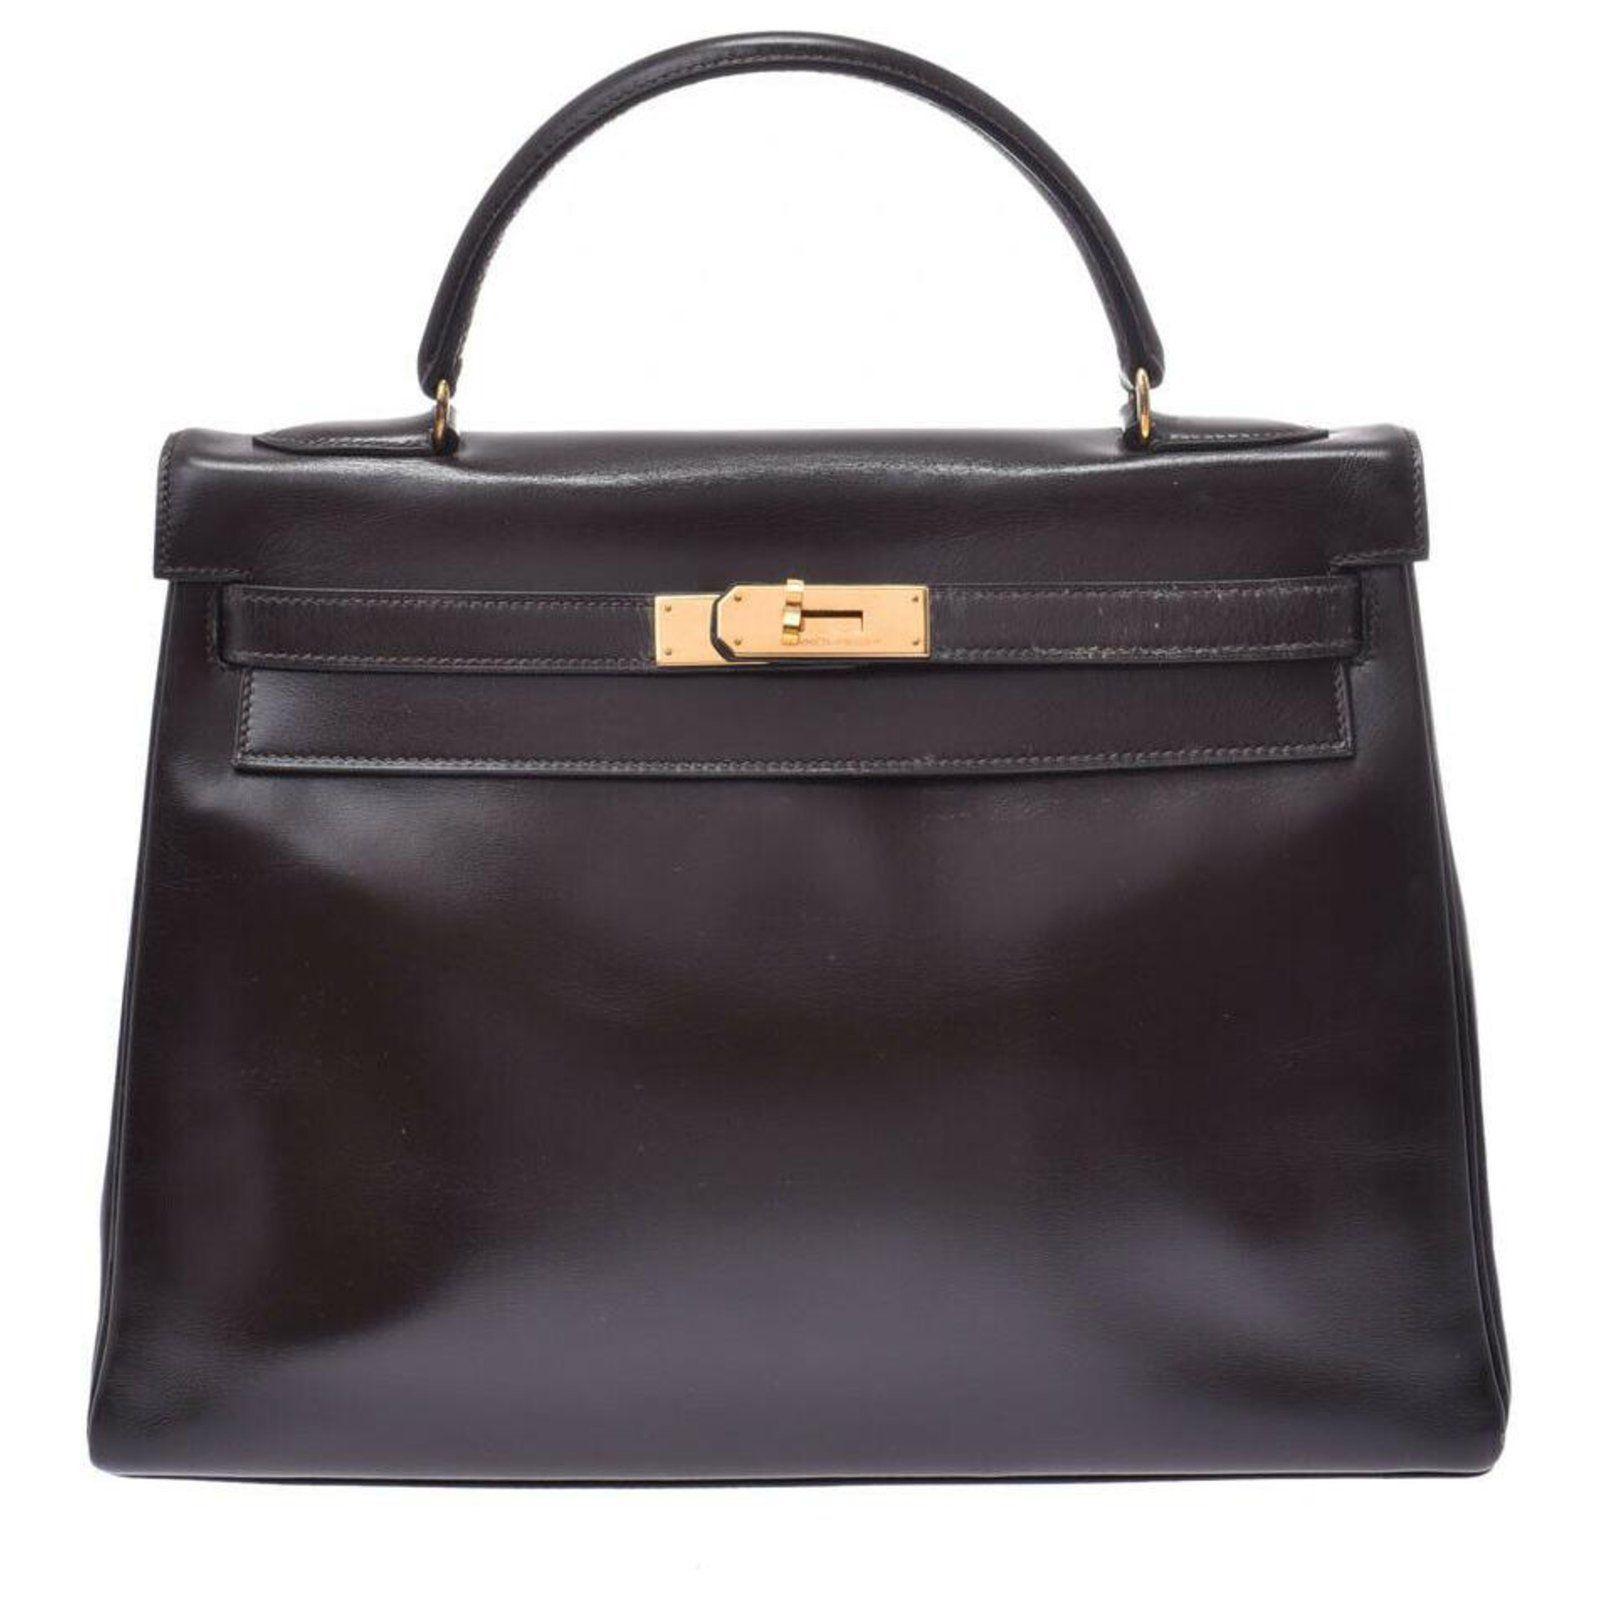 Photo of Hermès handbags Hermès handbag Other Black ref.156180 –  Hermès handbags Herm…